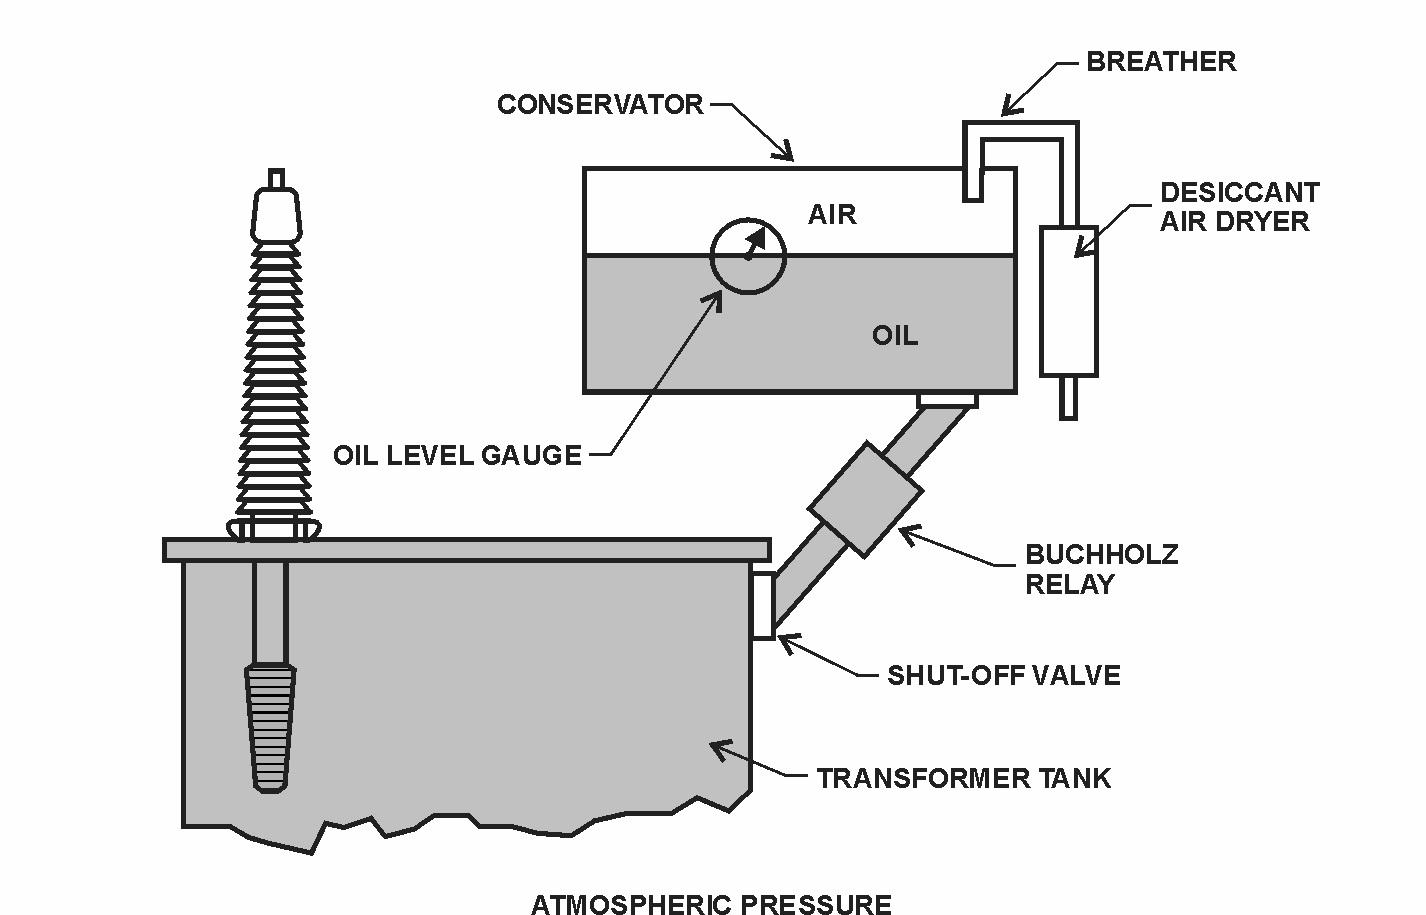 Buchholz Relay Transformer Wiring Diagram Control Panel